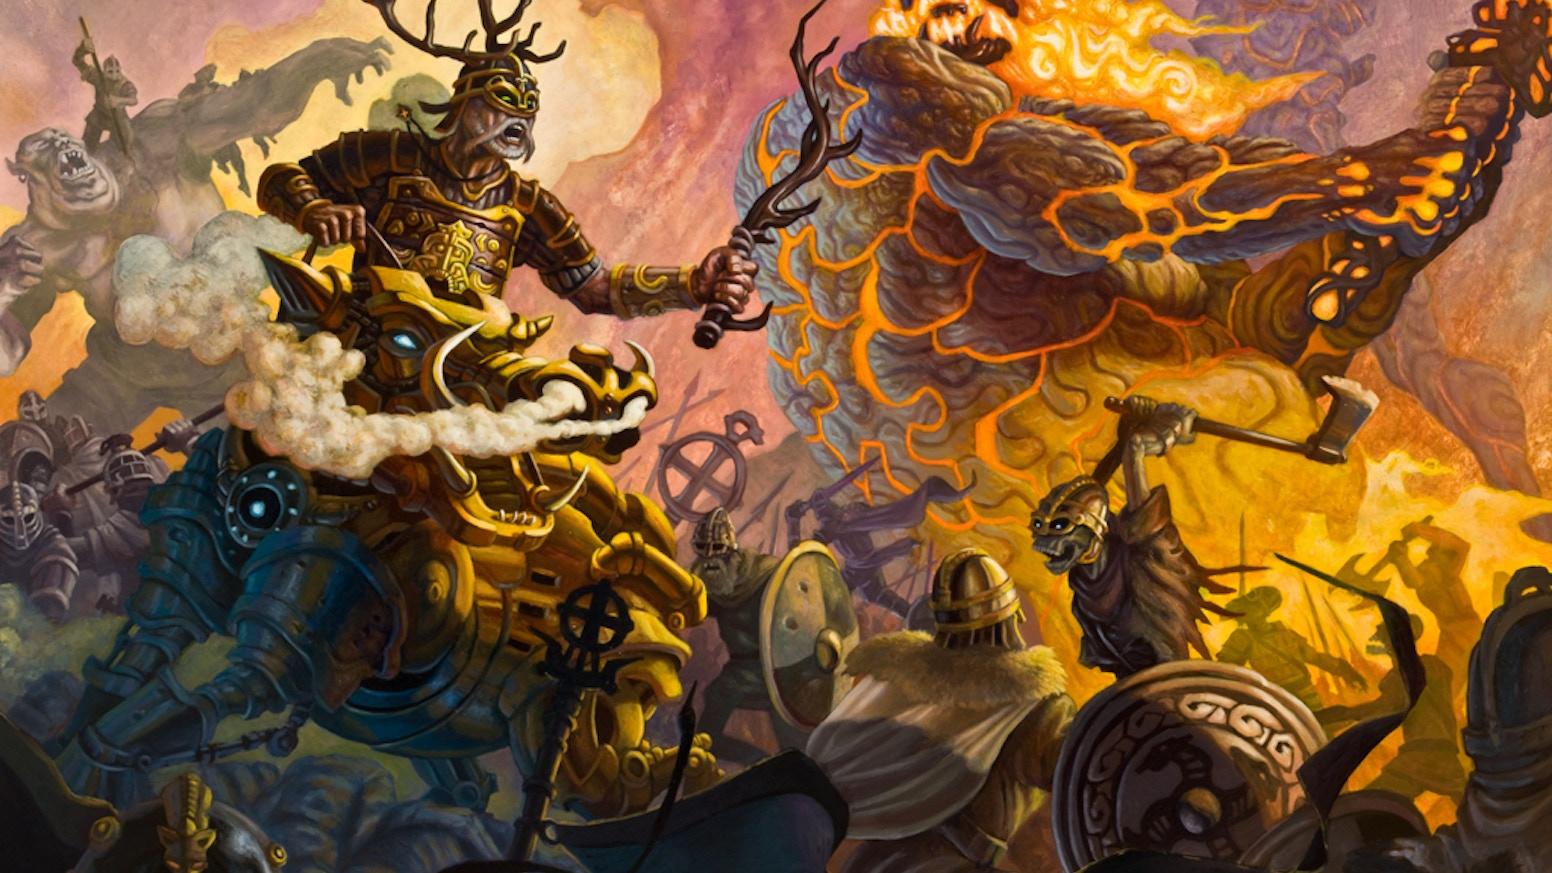 Norse Mythology Series by Sam Flegal - Binding of Loki by Sam Flegal ...